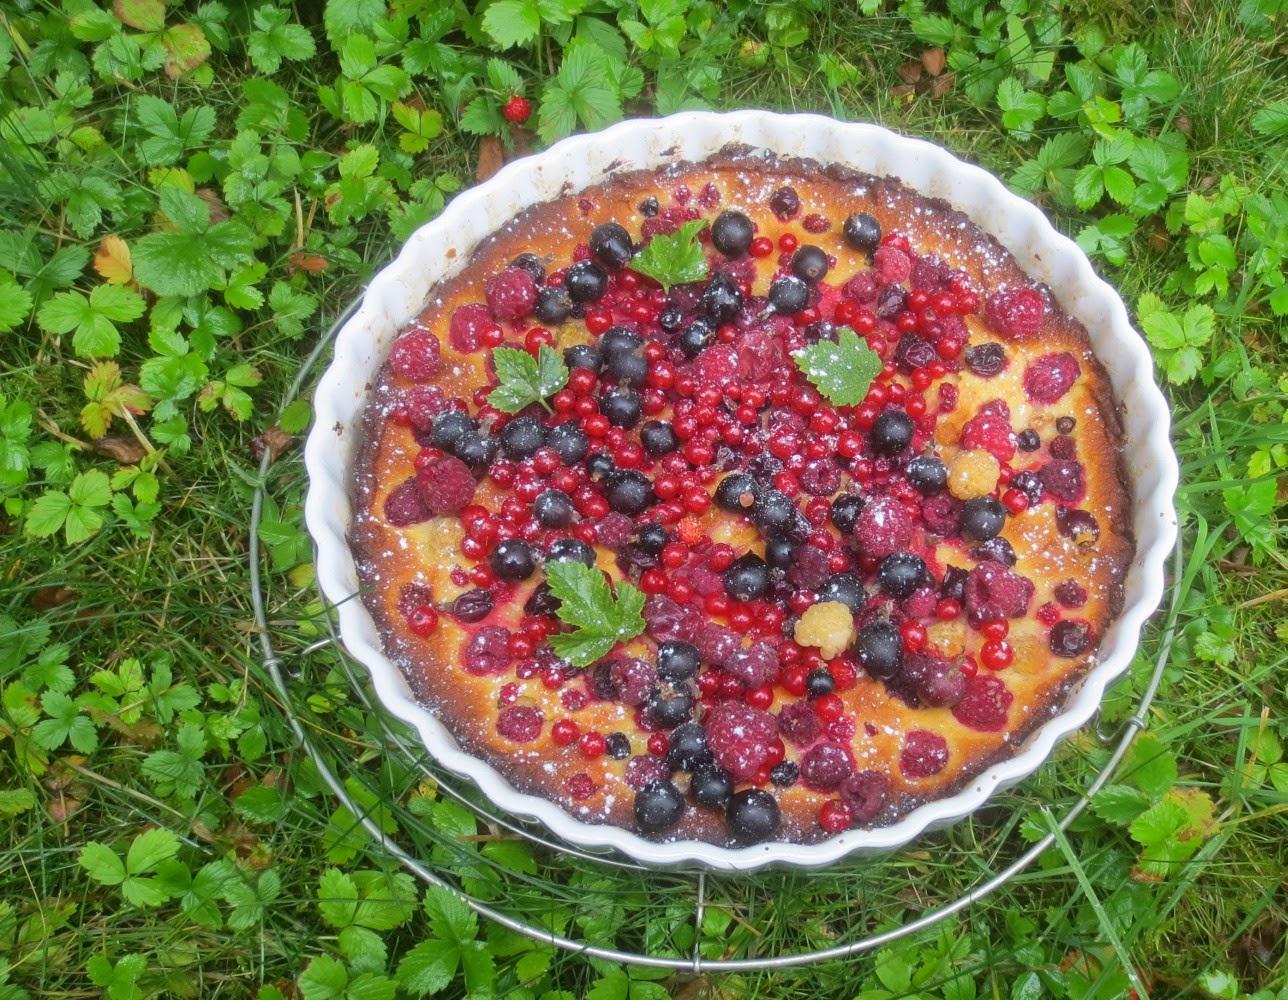 Gartenparty-Torte (Beeren-Marzipan-Kuchen)